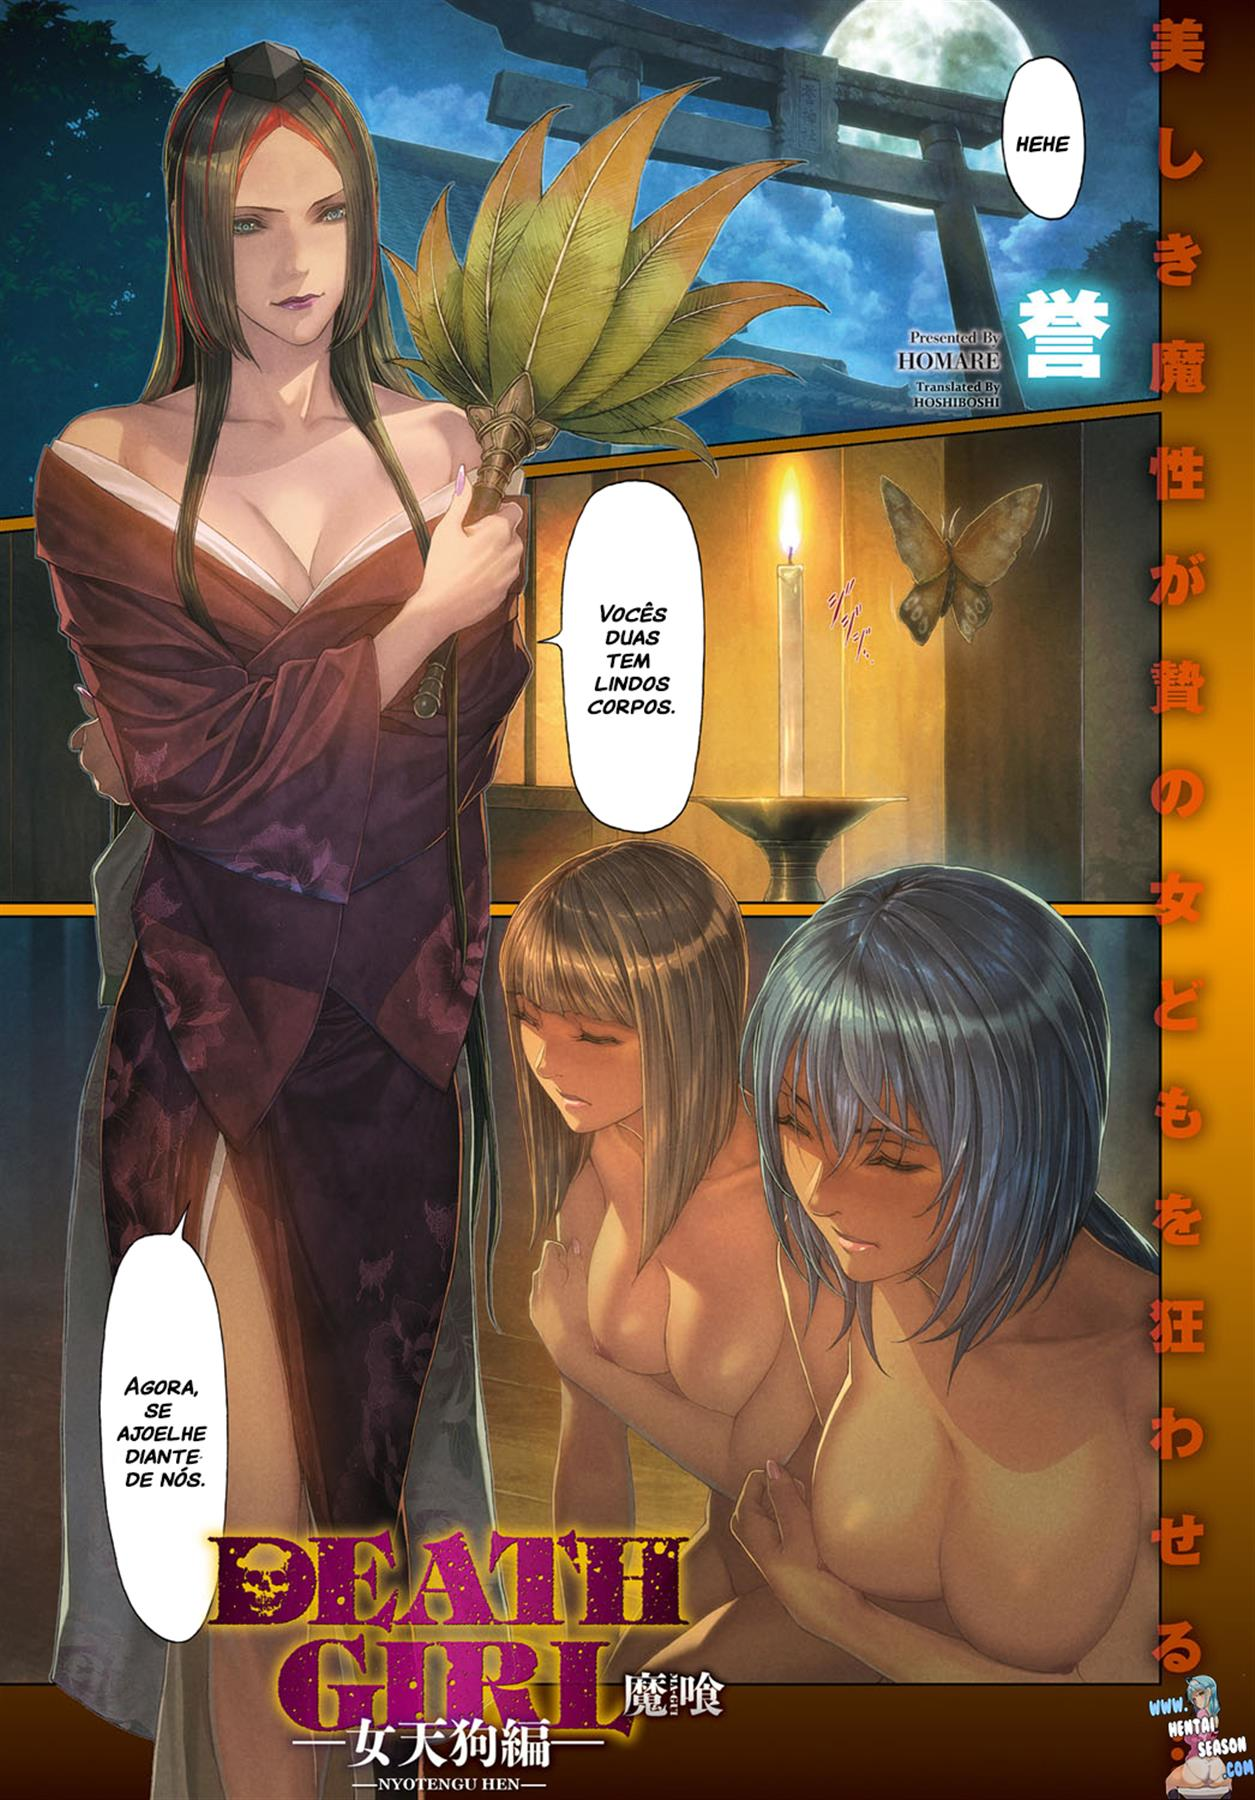 Ma-Gui -DEATH GIRL- Nyotengu Hen